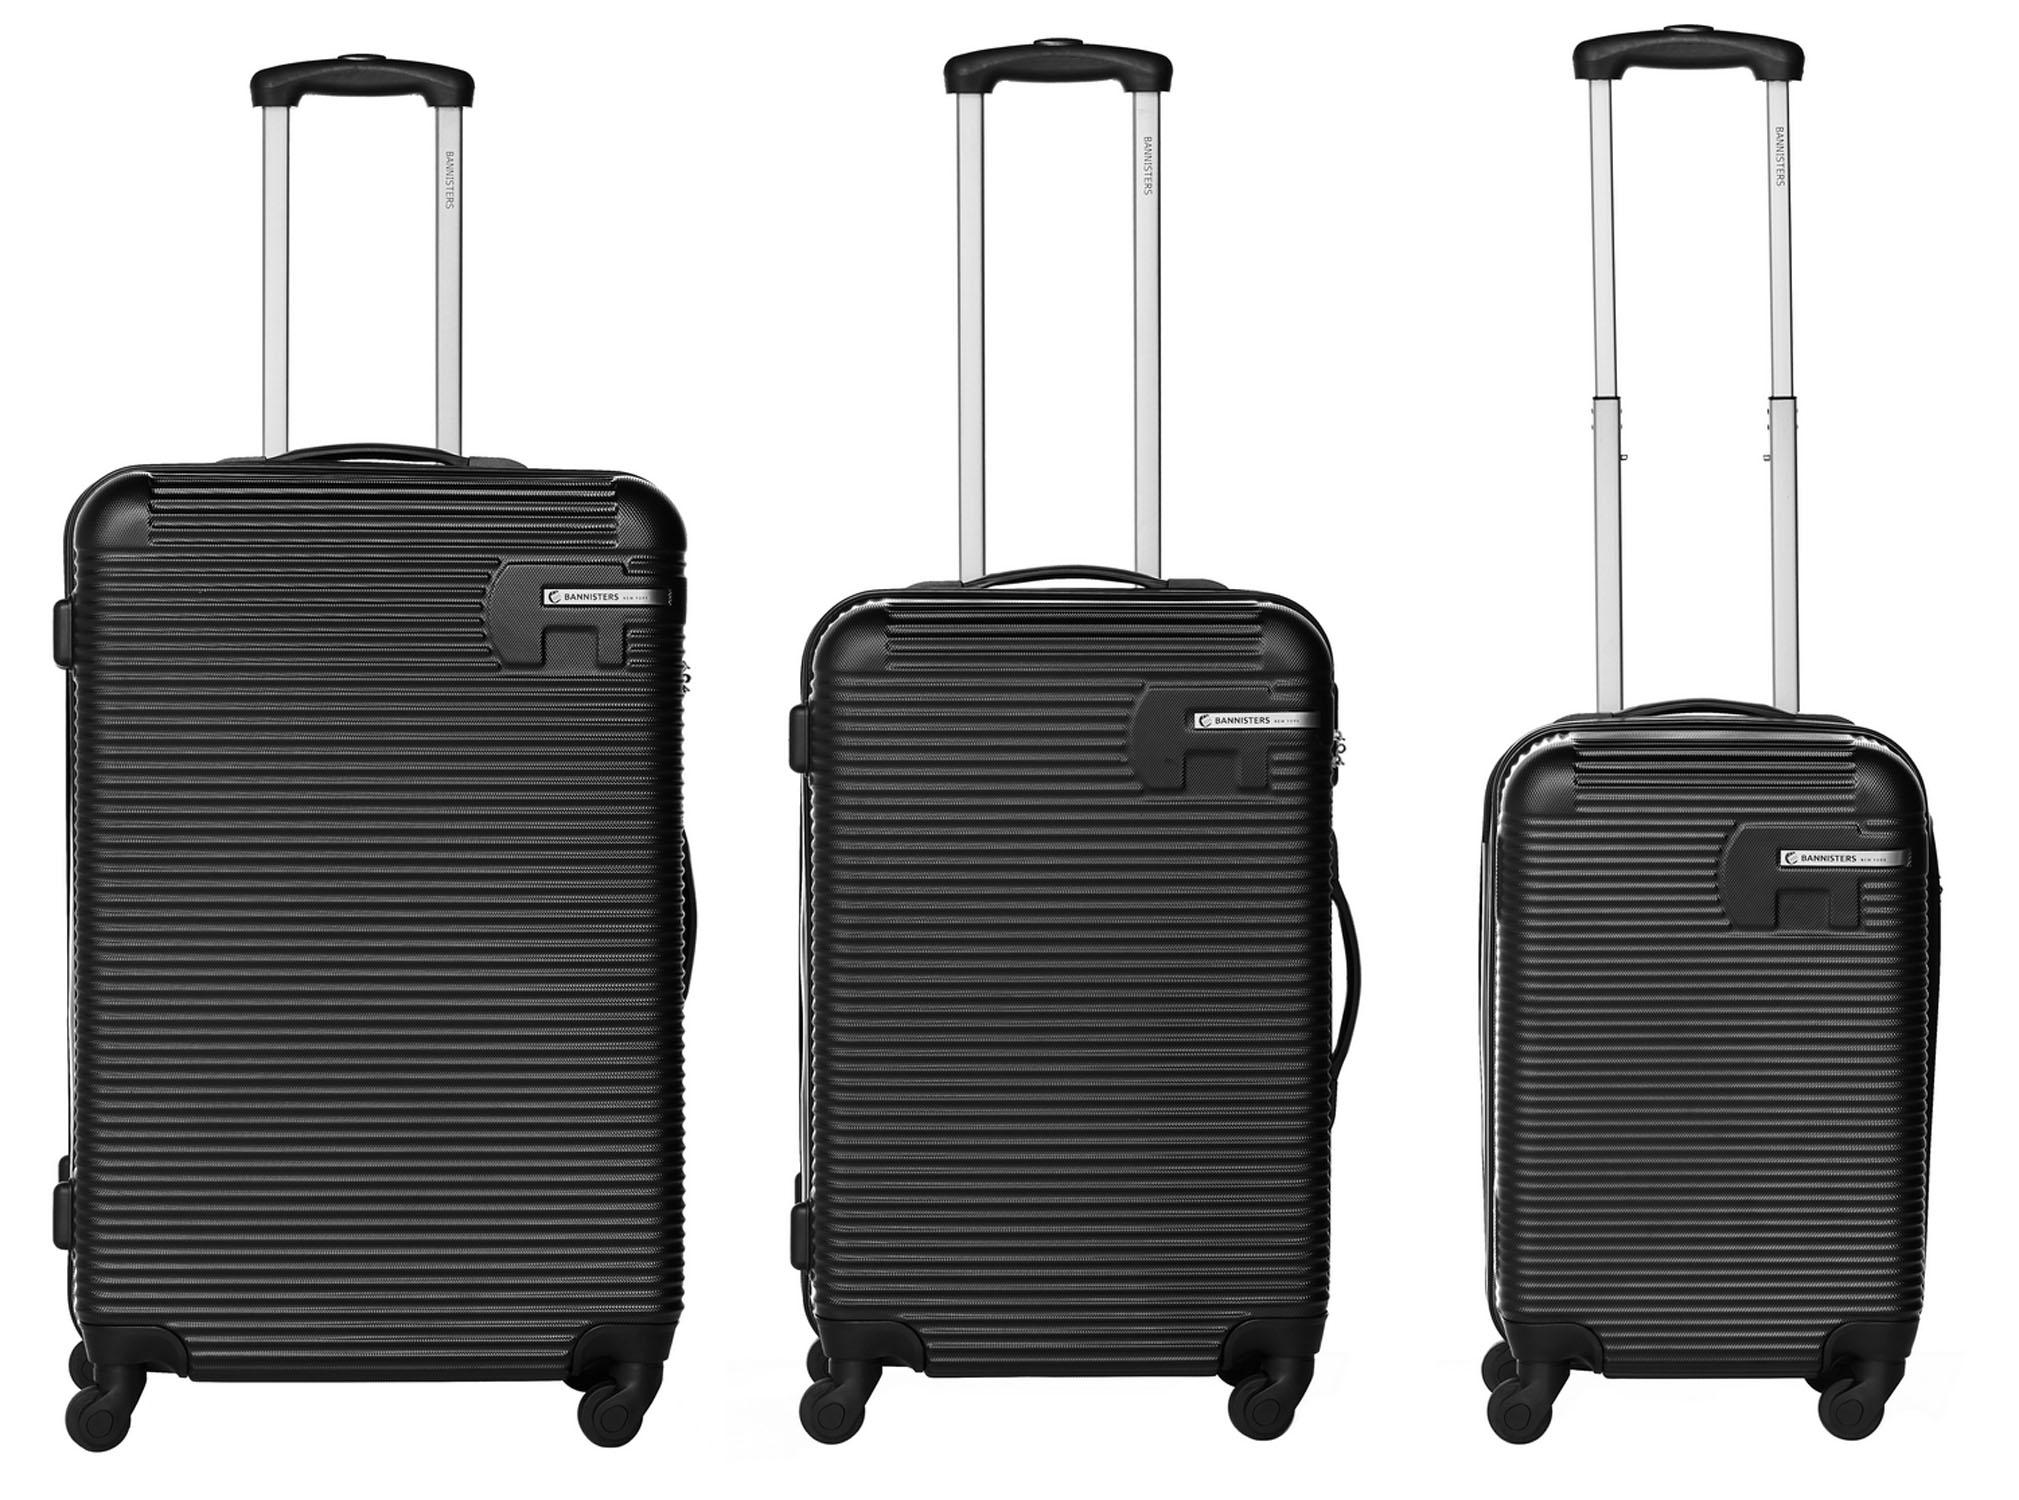 packenger hudson bannisters koffer 3er set schwarz jetzt auf kaufen. Black Bedroom Furniture Sets. Home Design Ideas